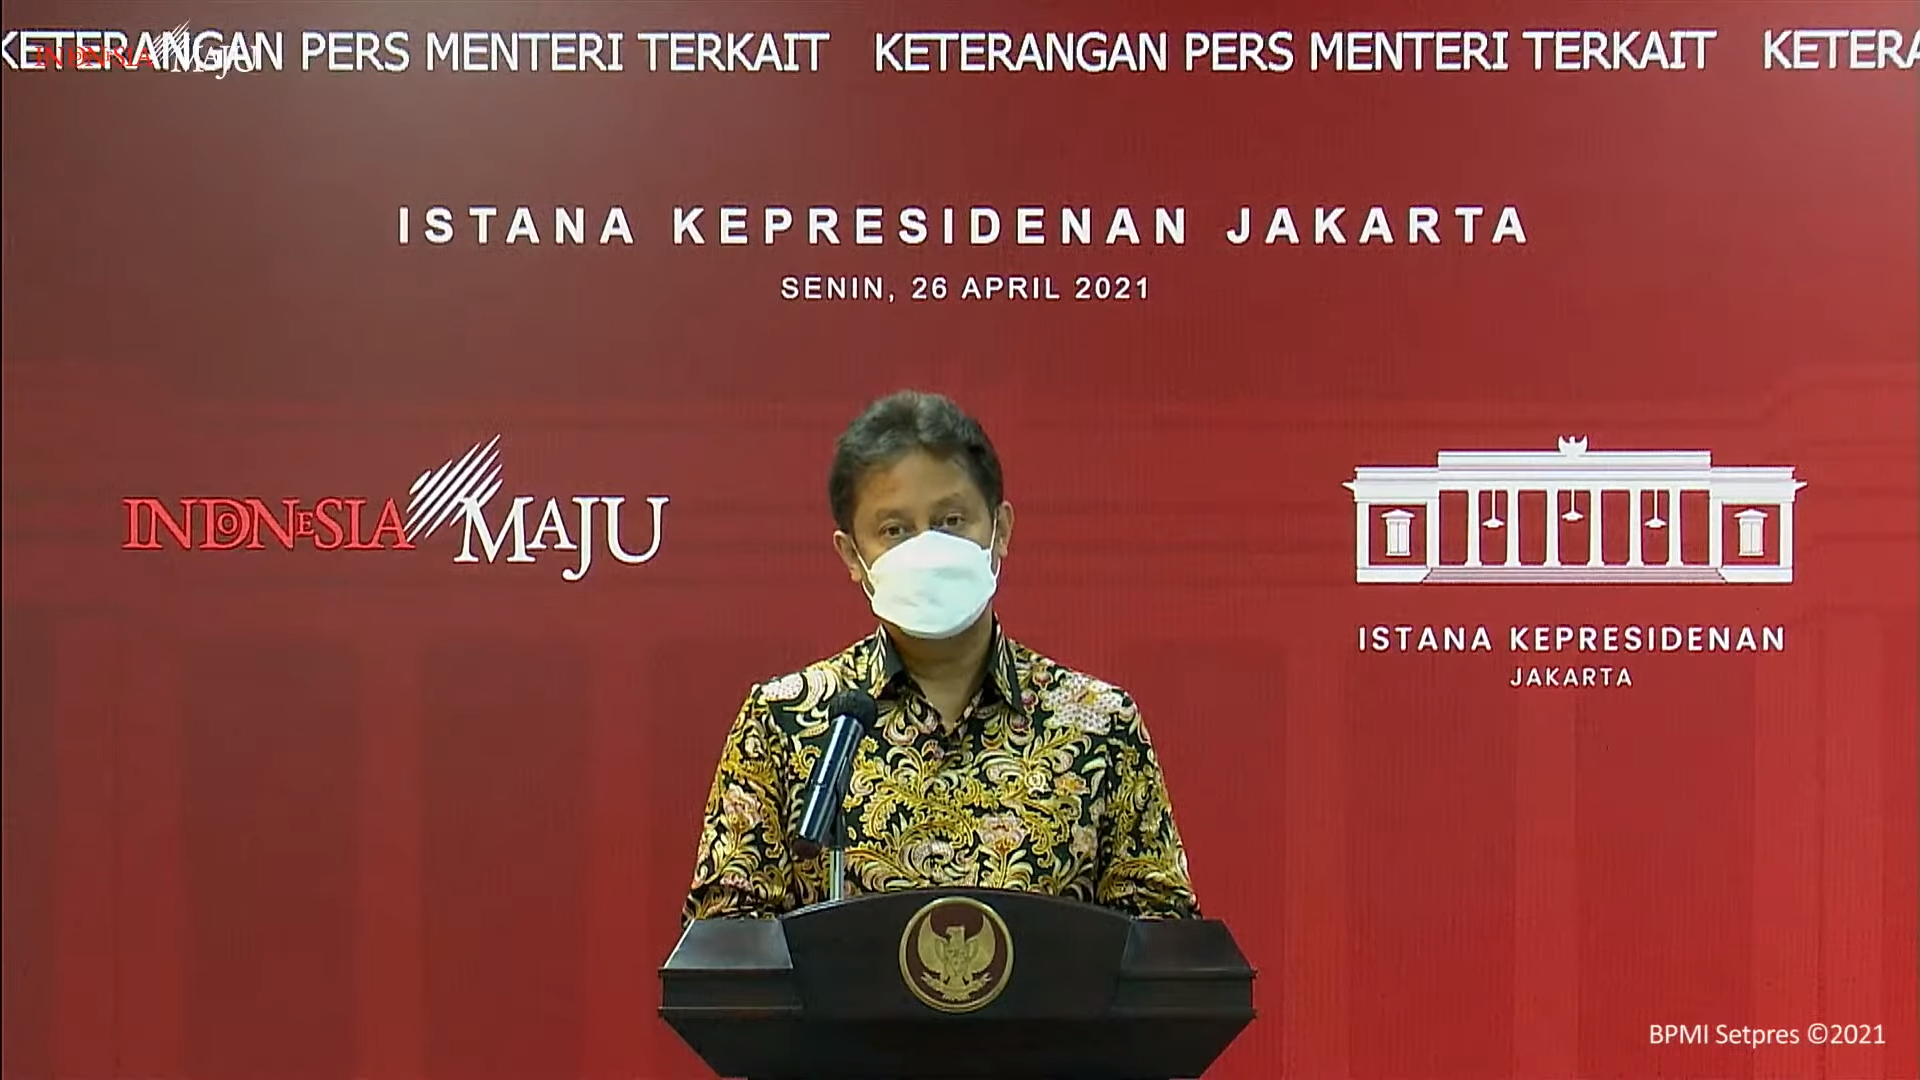 Mutasi Corona Seperti India Sudah Tiba di Indonesia, 10 Orang Tertular